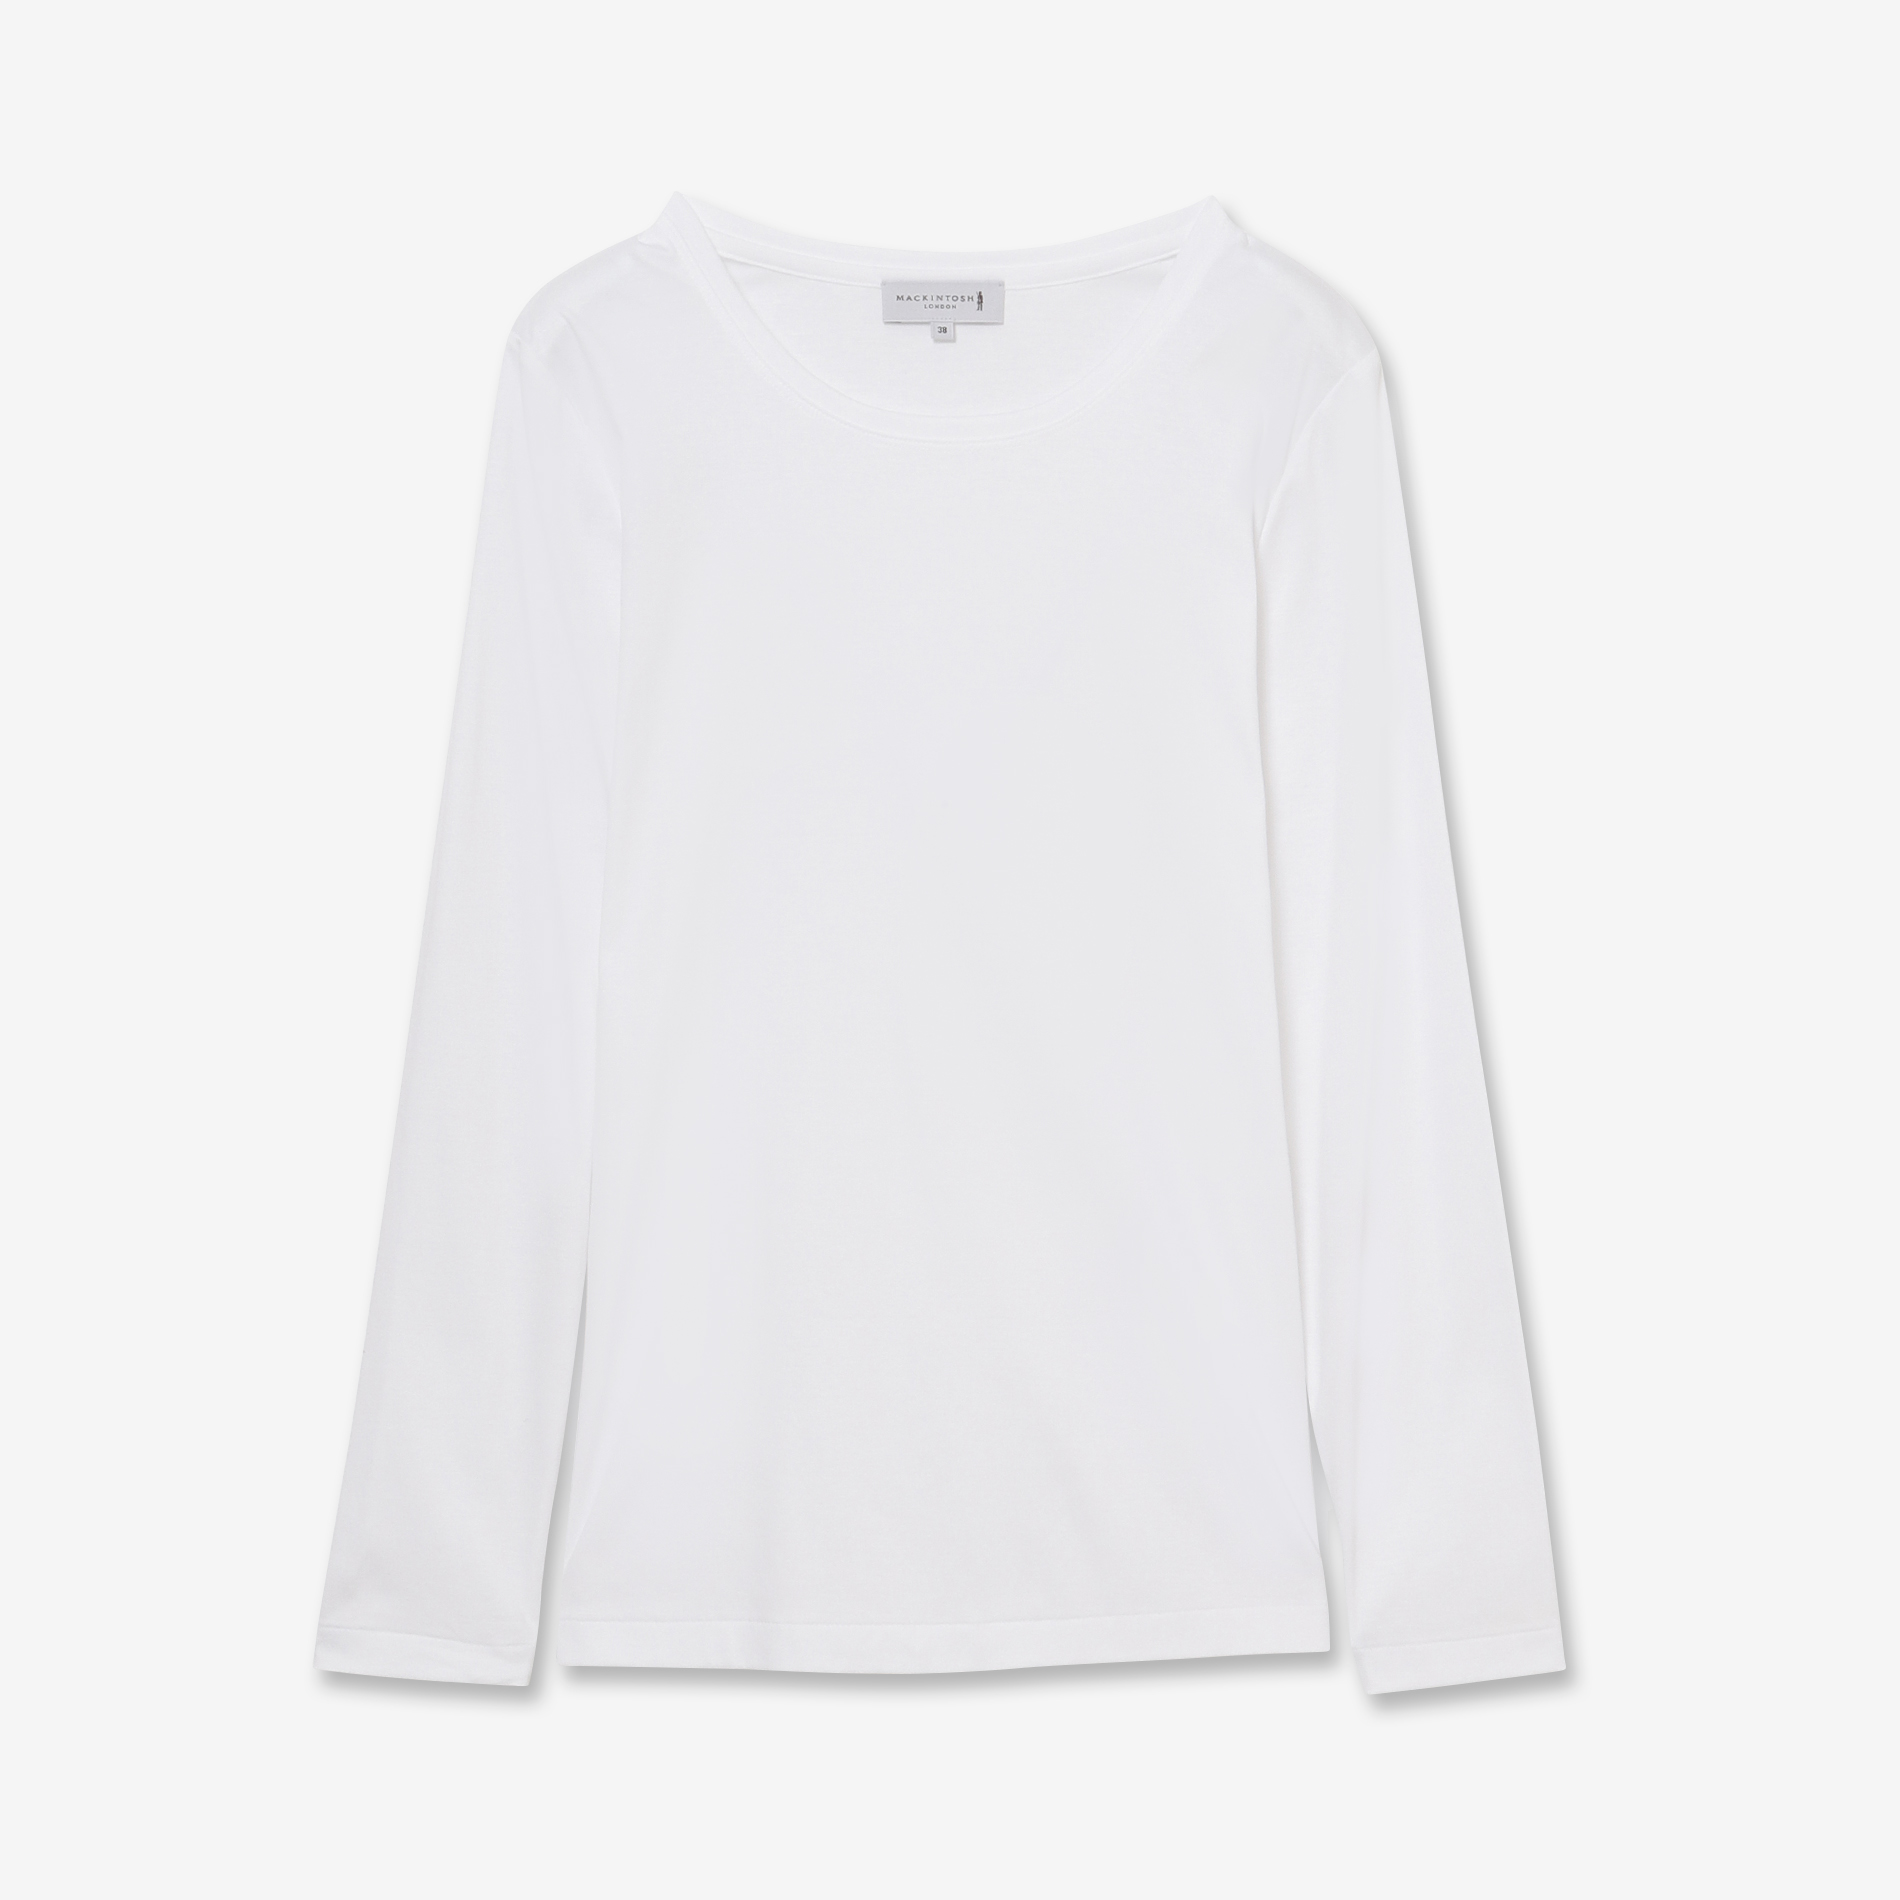 【The Essential Collection】スーピマコットン長袖Tシャツ